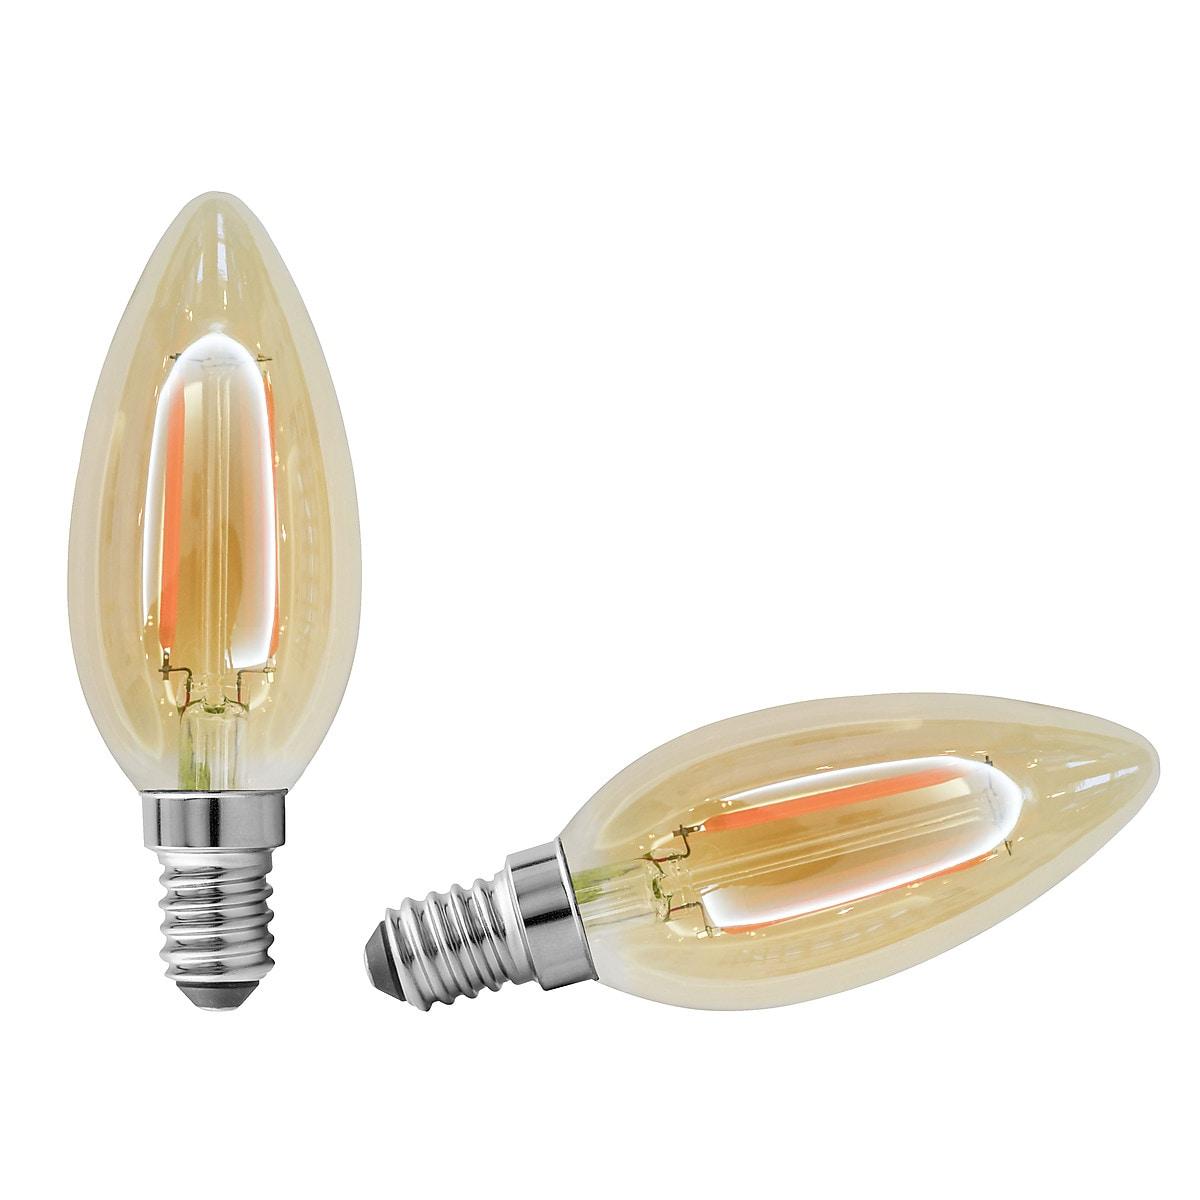 Northlight E14 Candle LED Filament Bulb